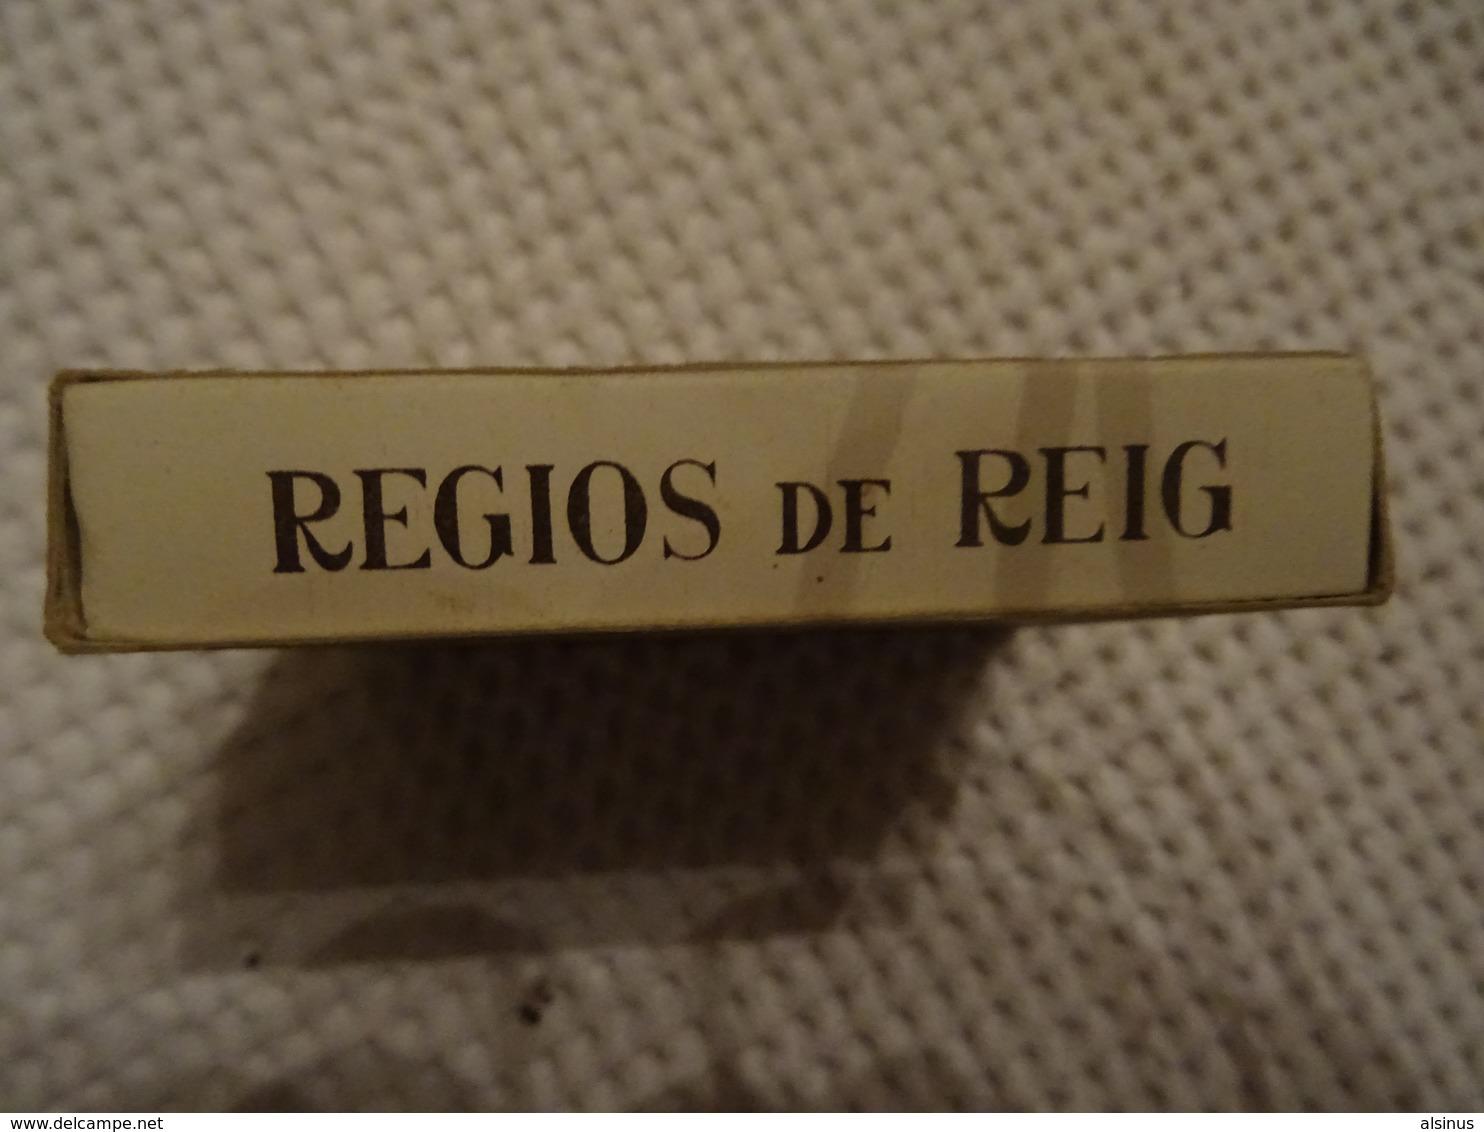 ETUI DE 20 CIGARILLOS VIDE - LA NUEVA HABANA - JULIAN REIG - Zigarrenetuis